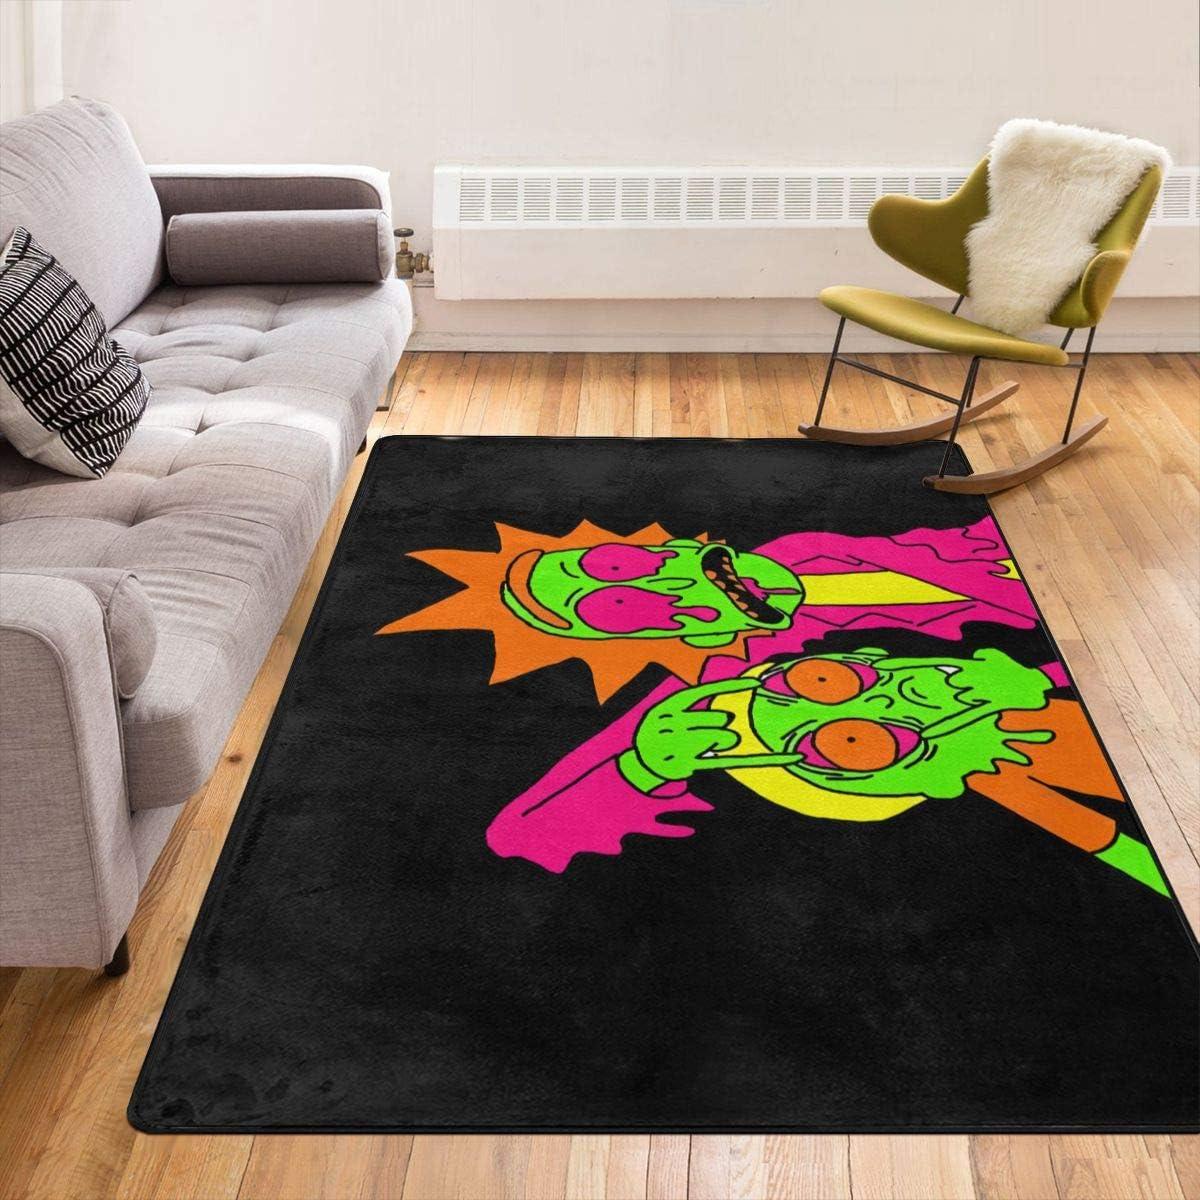 Zuzuzj Rick&Morty Home Decor Non-Slip Indoor Outdoor Floor Mat Large Area Rug Machine Washable Carpet Decor Living Room Dining Room Play Room Carpet 80 X 58 Inches